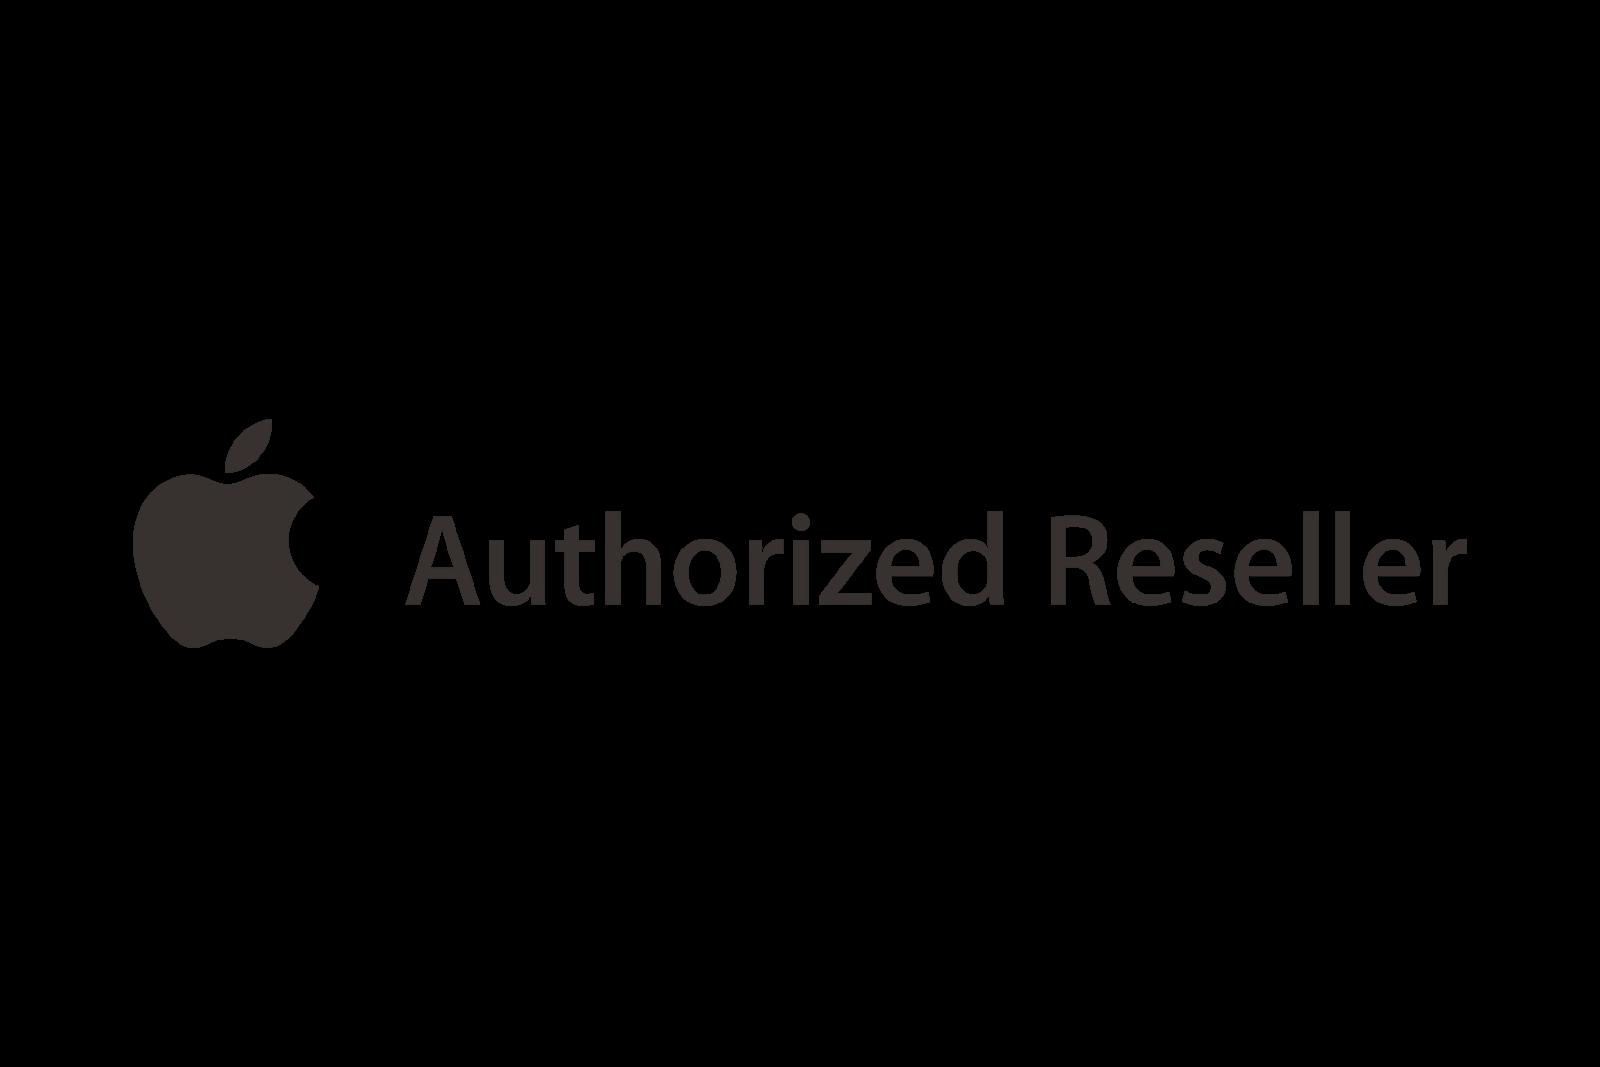 Apple Authorized Dealer PNG - 35515